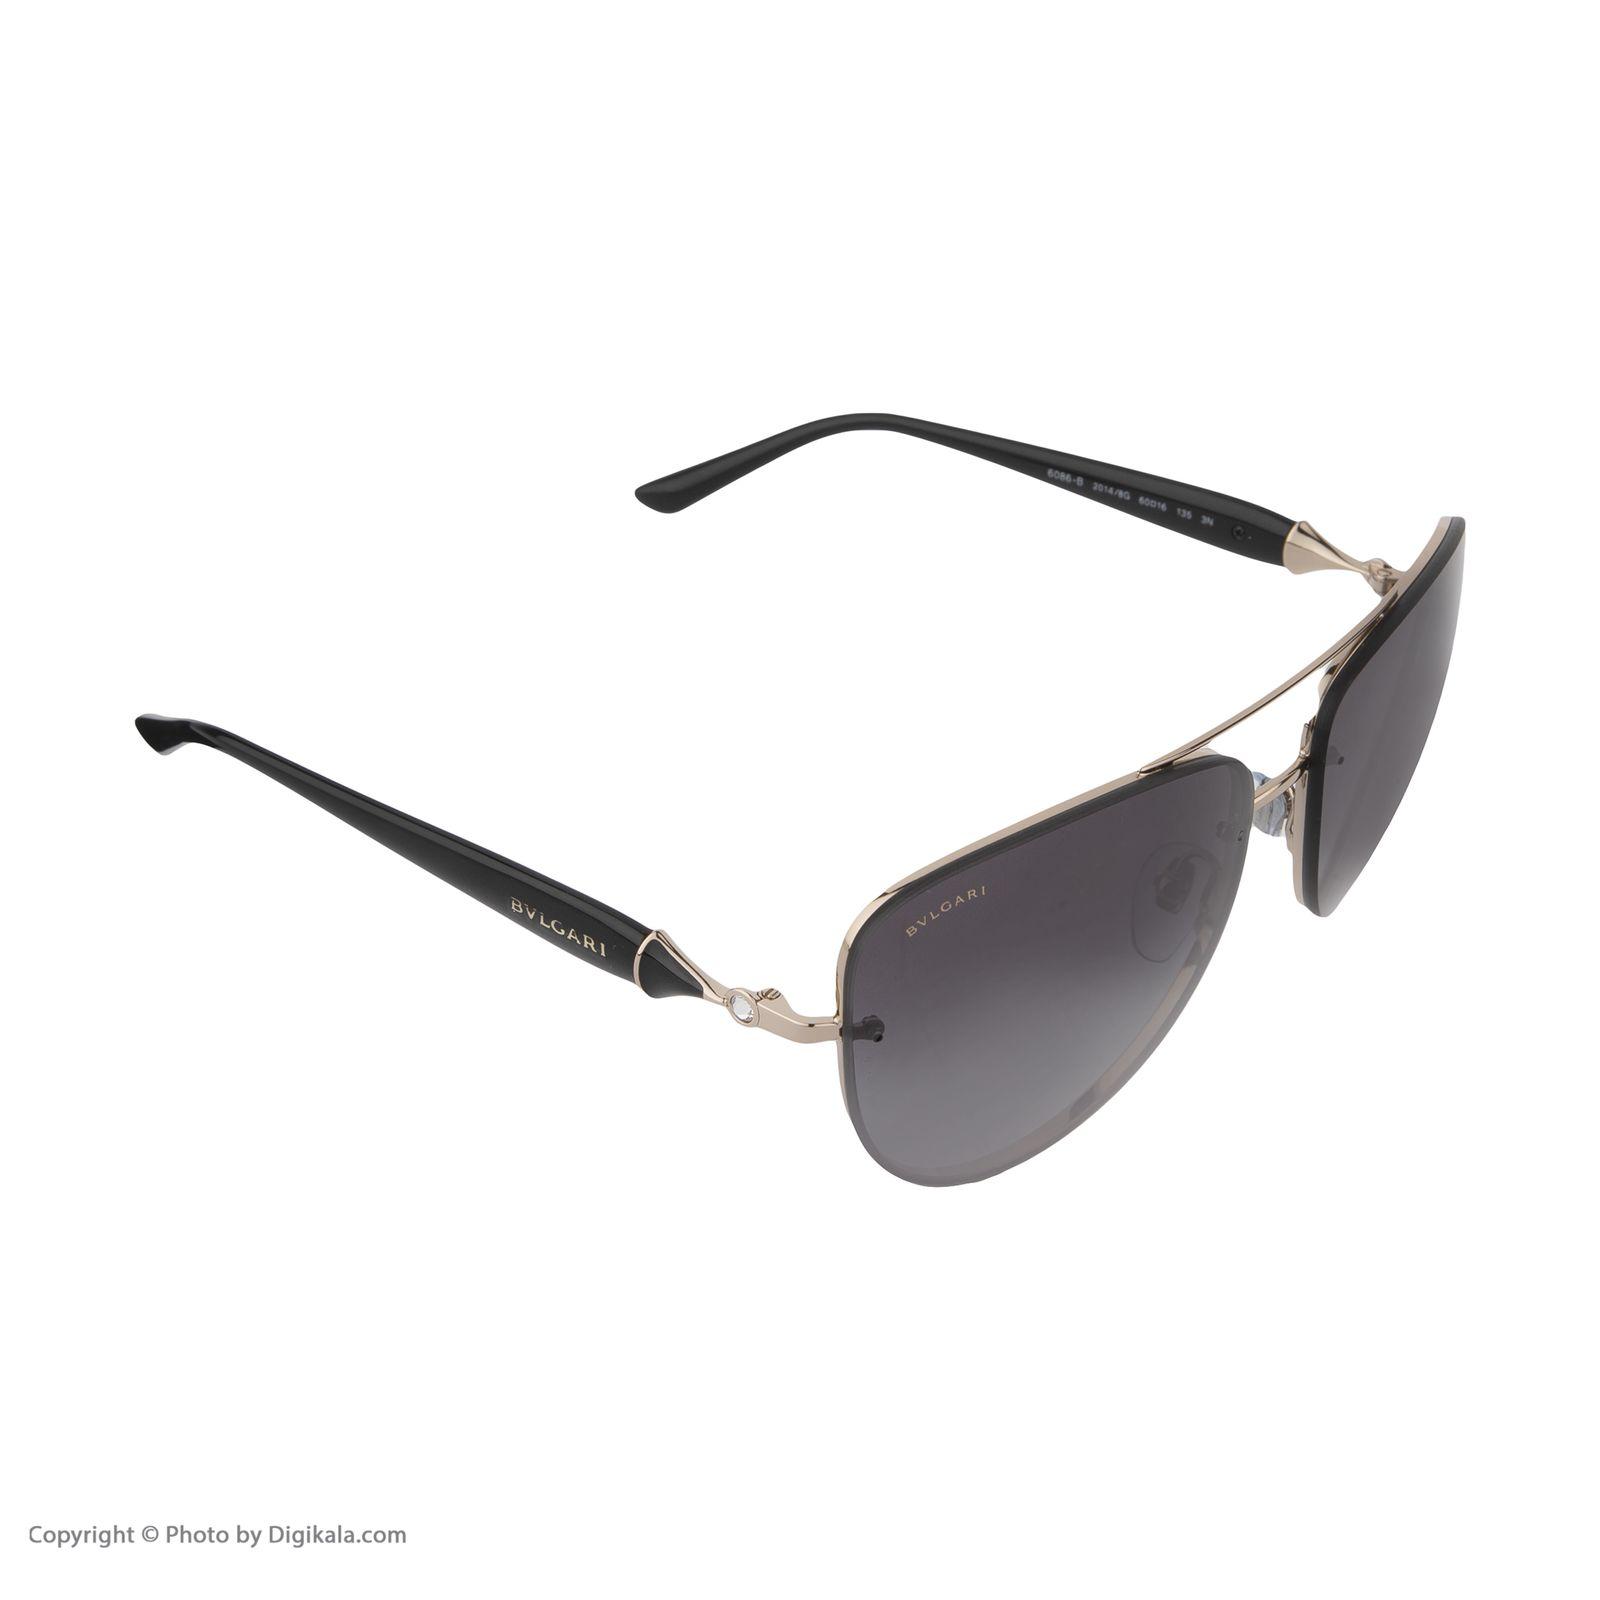 عینک آفتابی مردانه بولگاری مدل BV6086B 20148G -  - 4